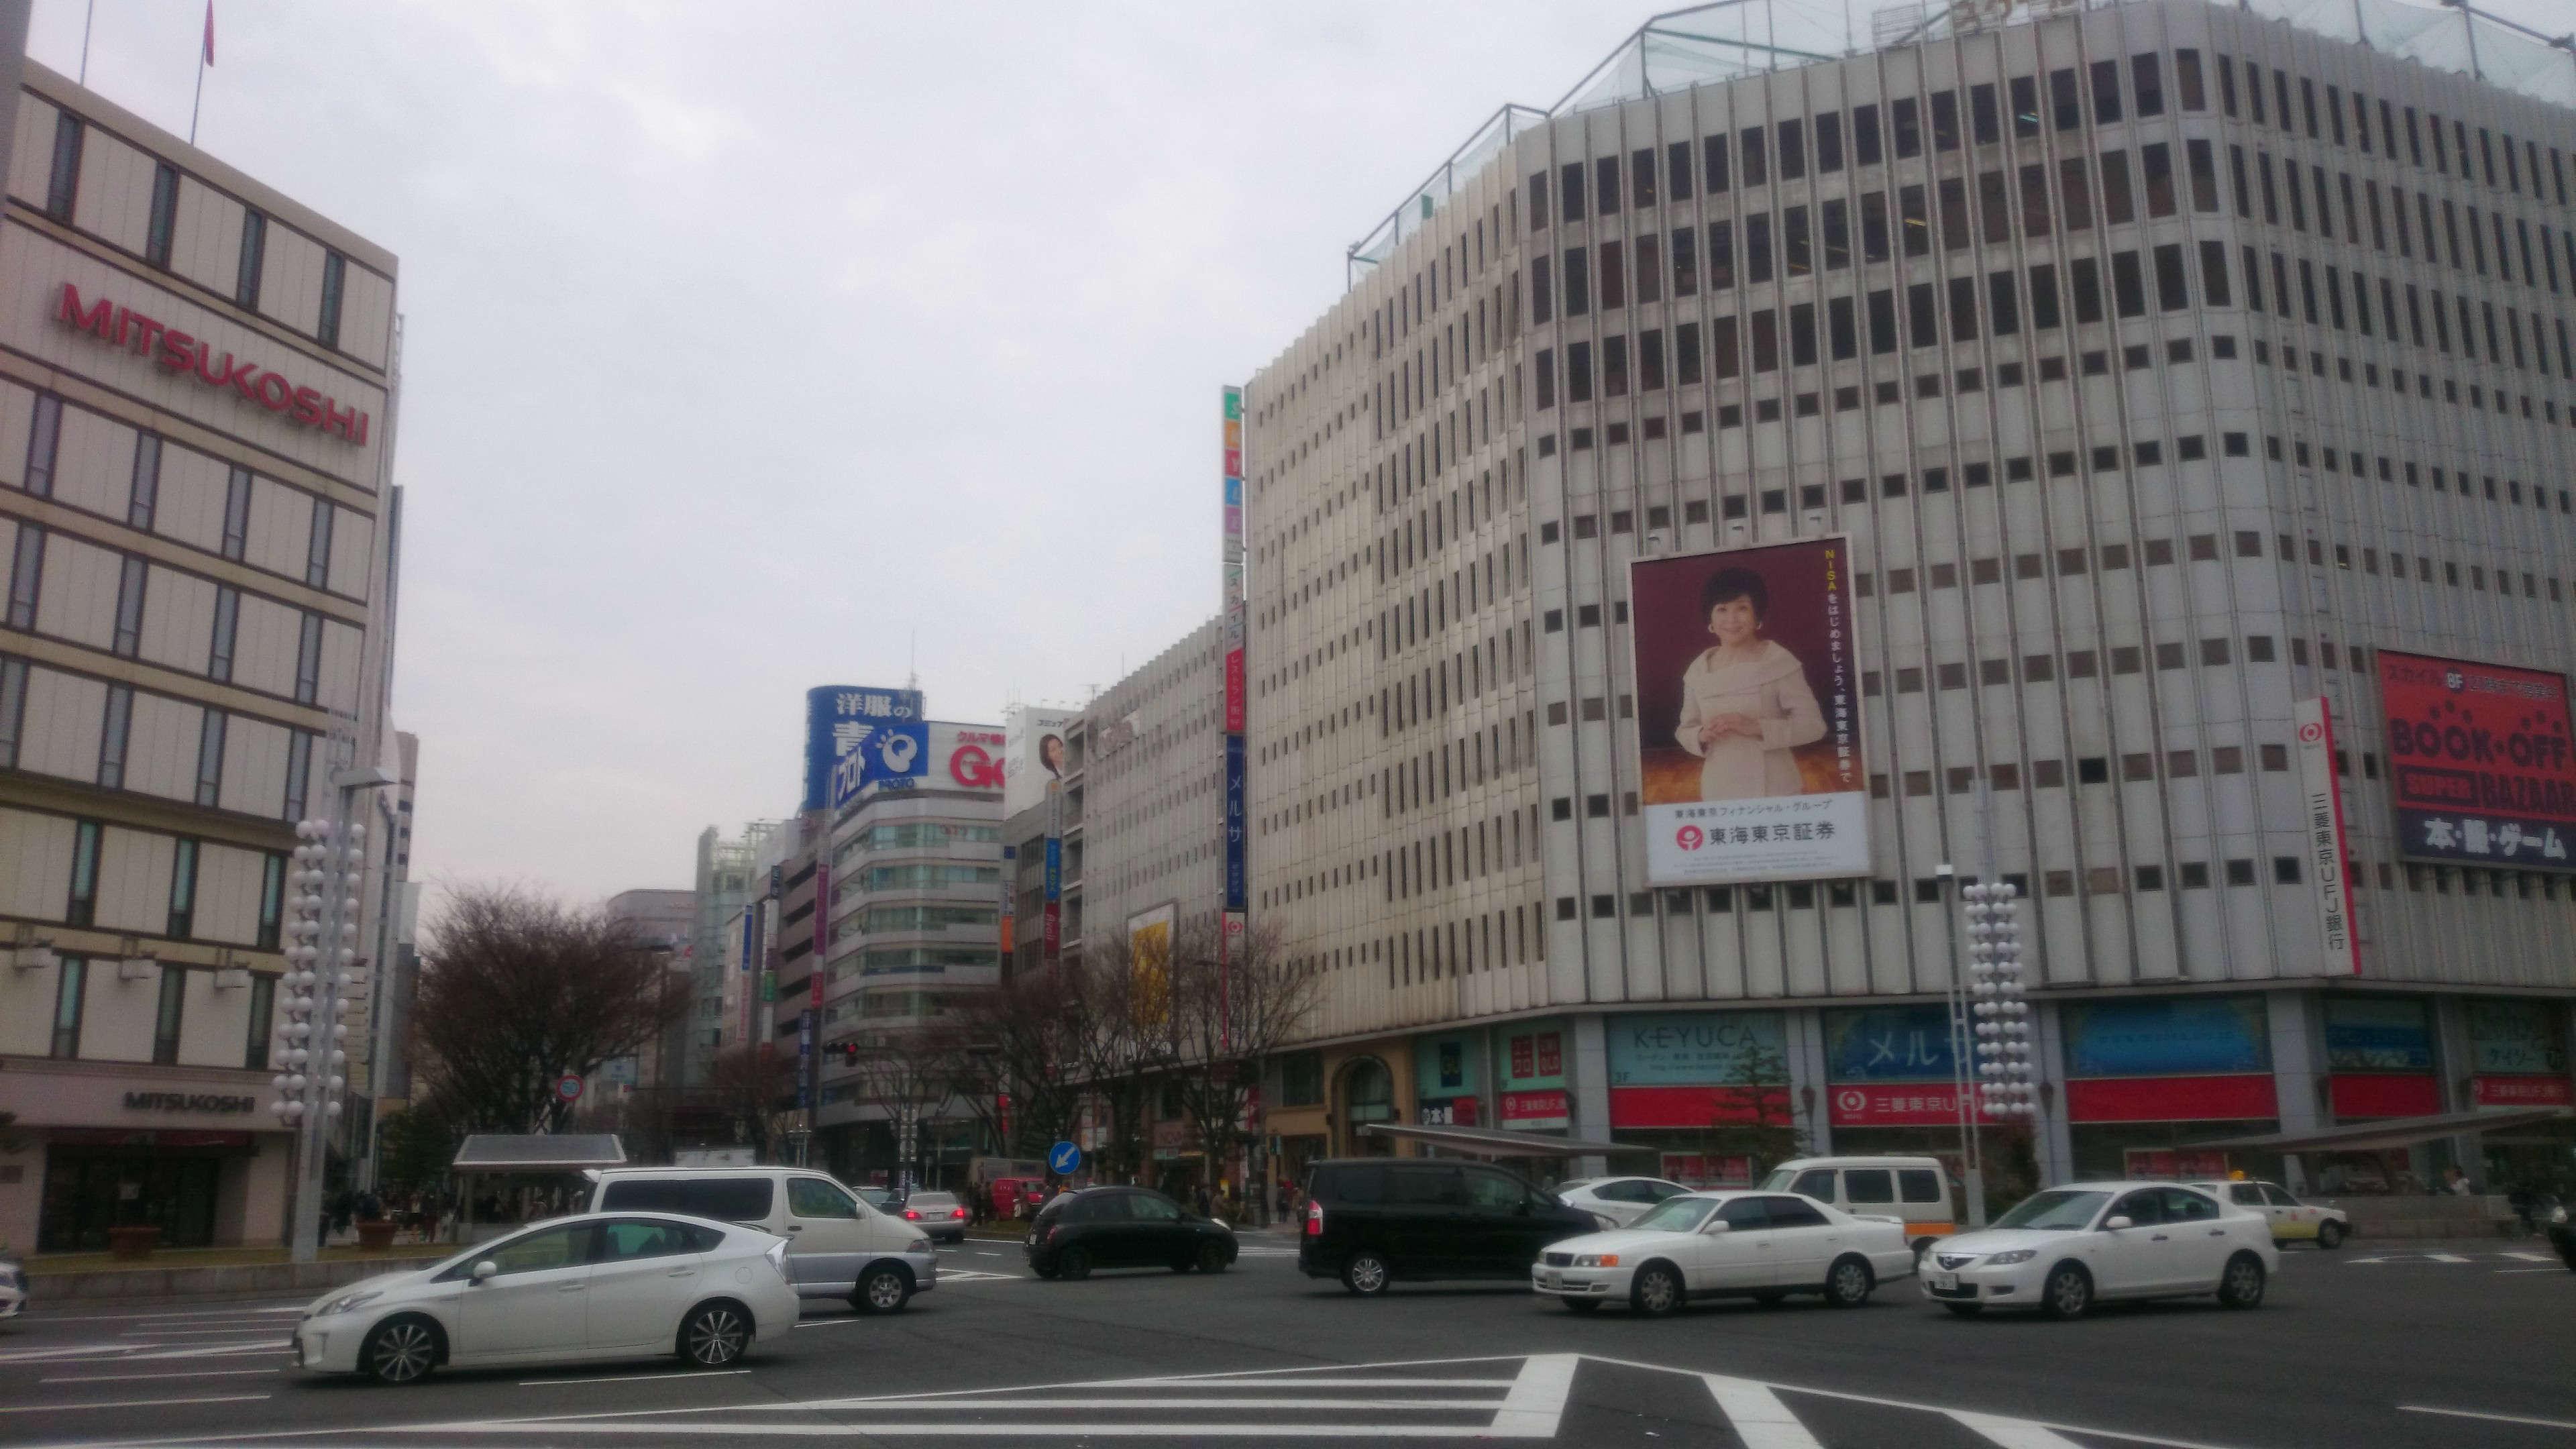 new_ワイコン未装着